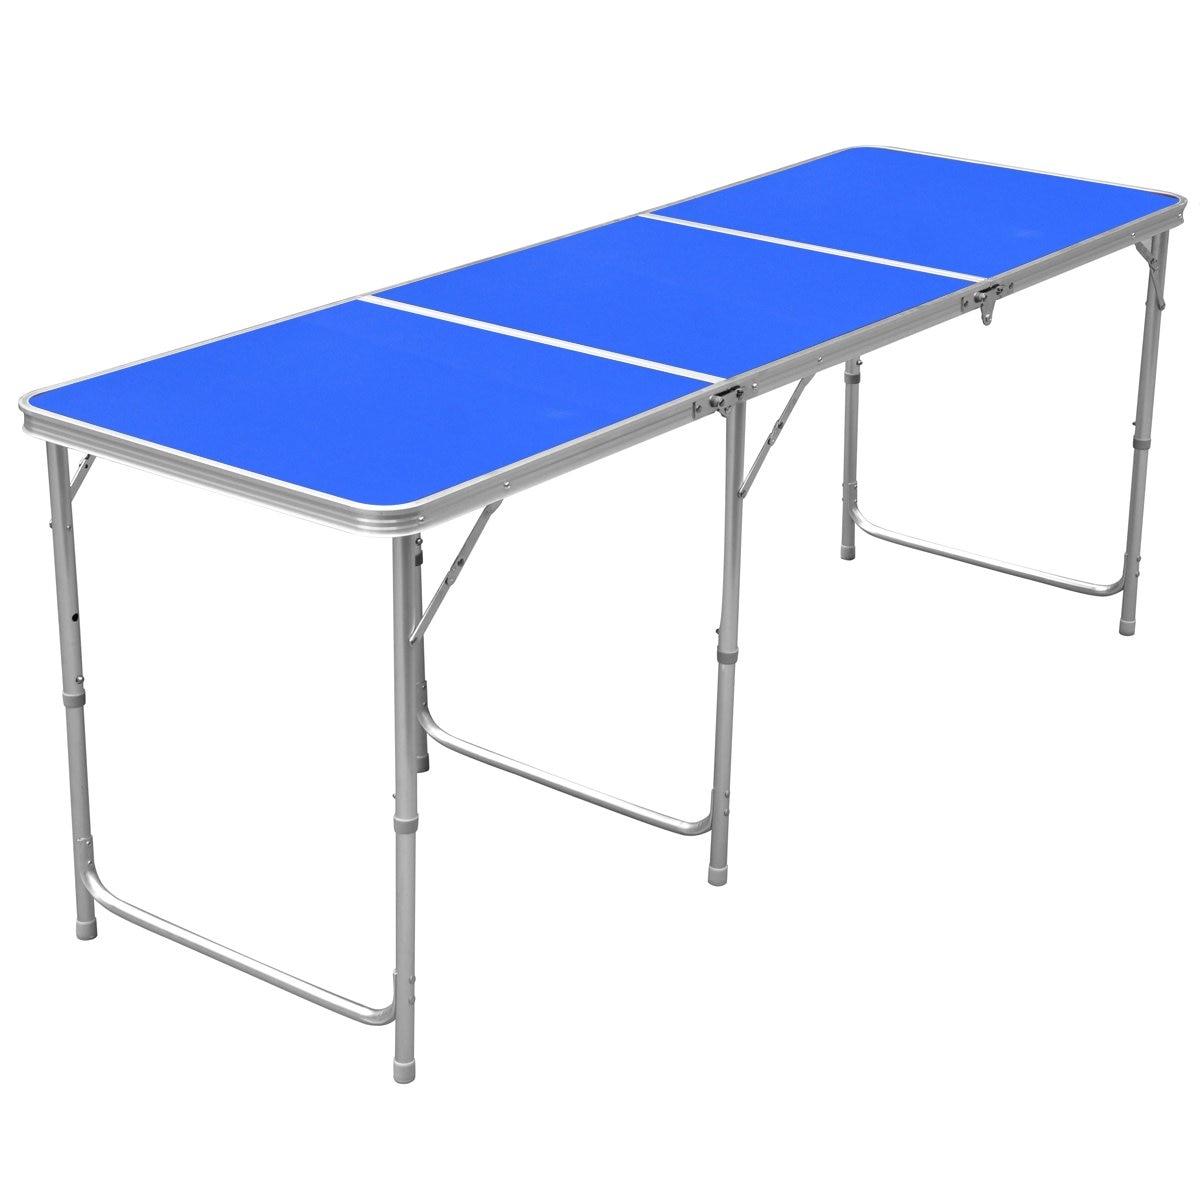 1.8m/6ft Aluminum Portable Folding Camping Picnic Party Dining Table jfbl 2x 1 8m 6ft aluminum portable folding camping picnic party dining table